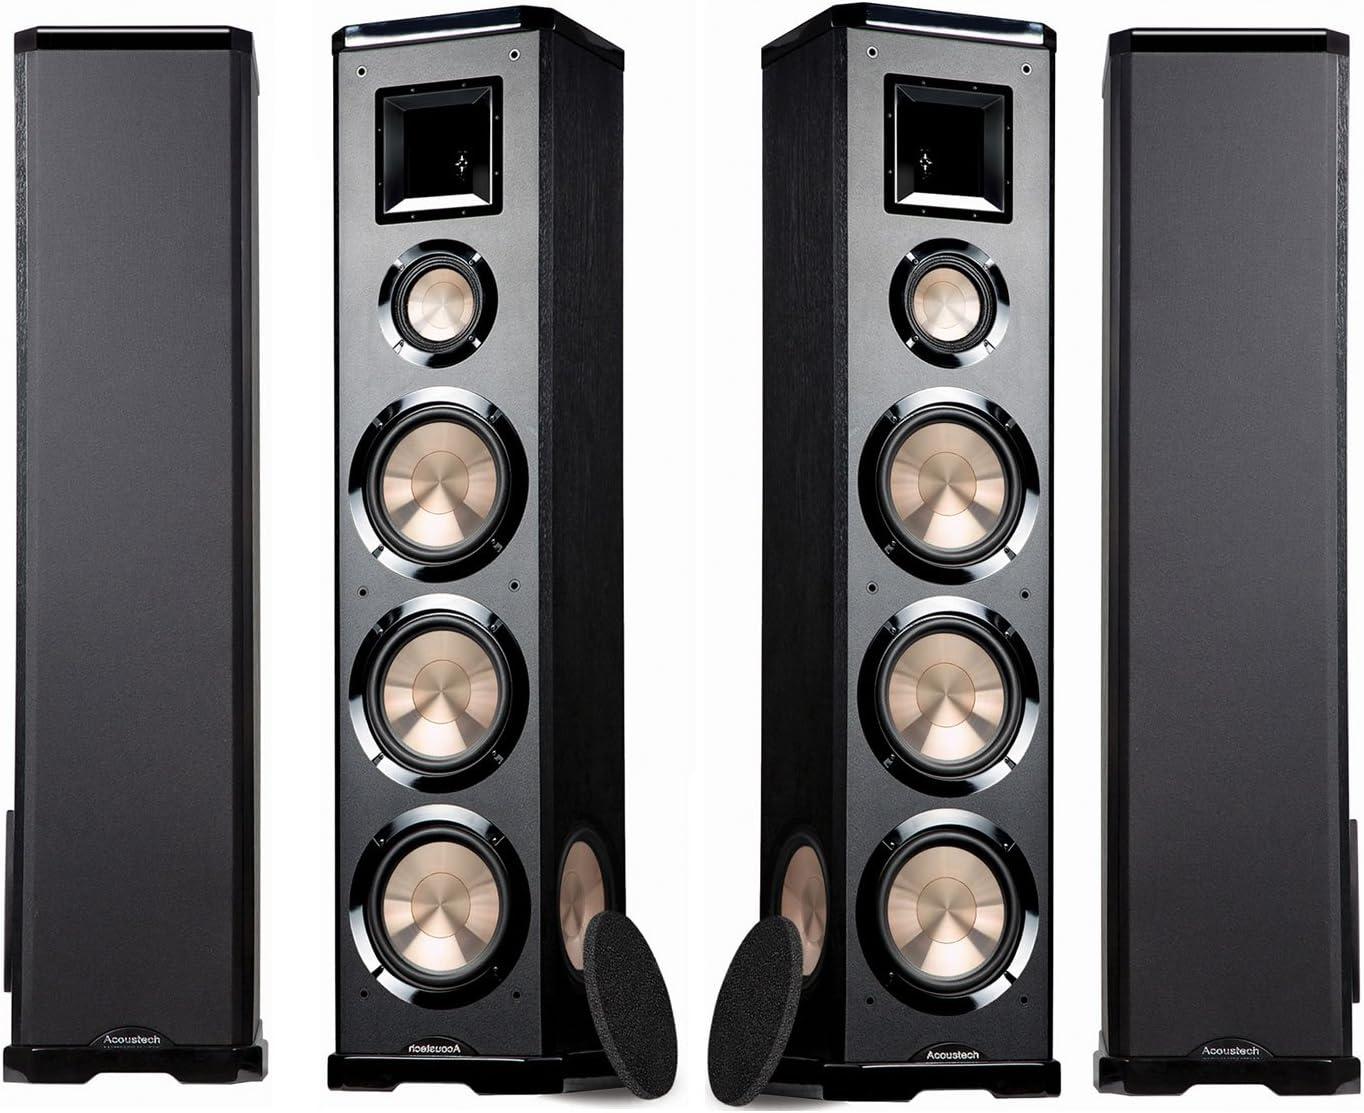 BIC Acoustech PL-980L-PL-980R 3-Way Floor Speakers – ONE Pair